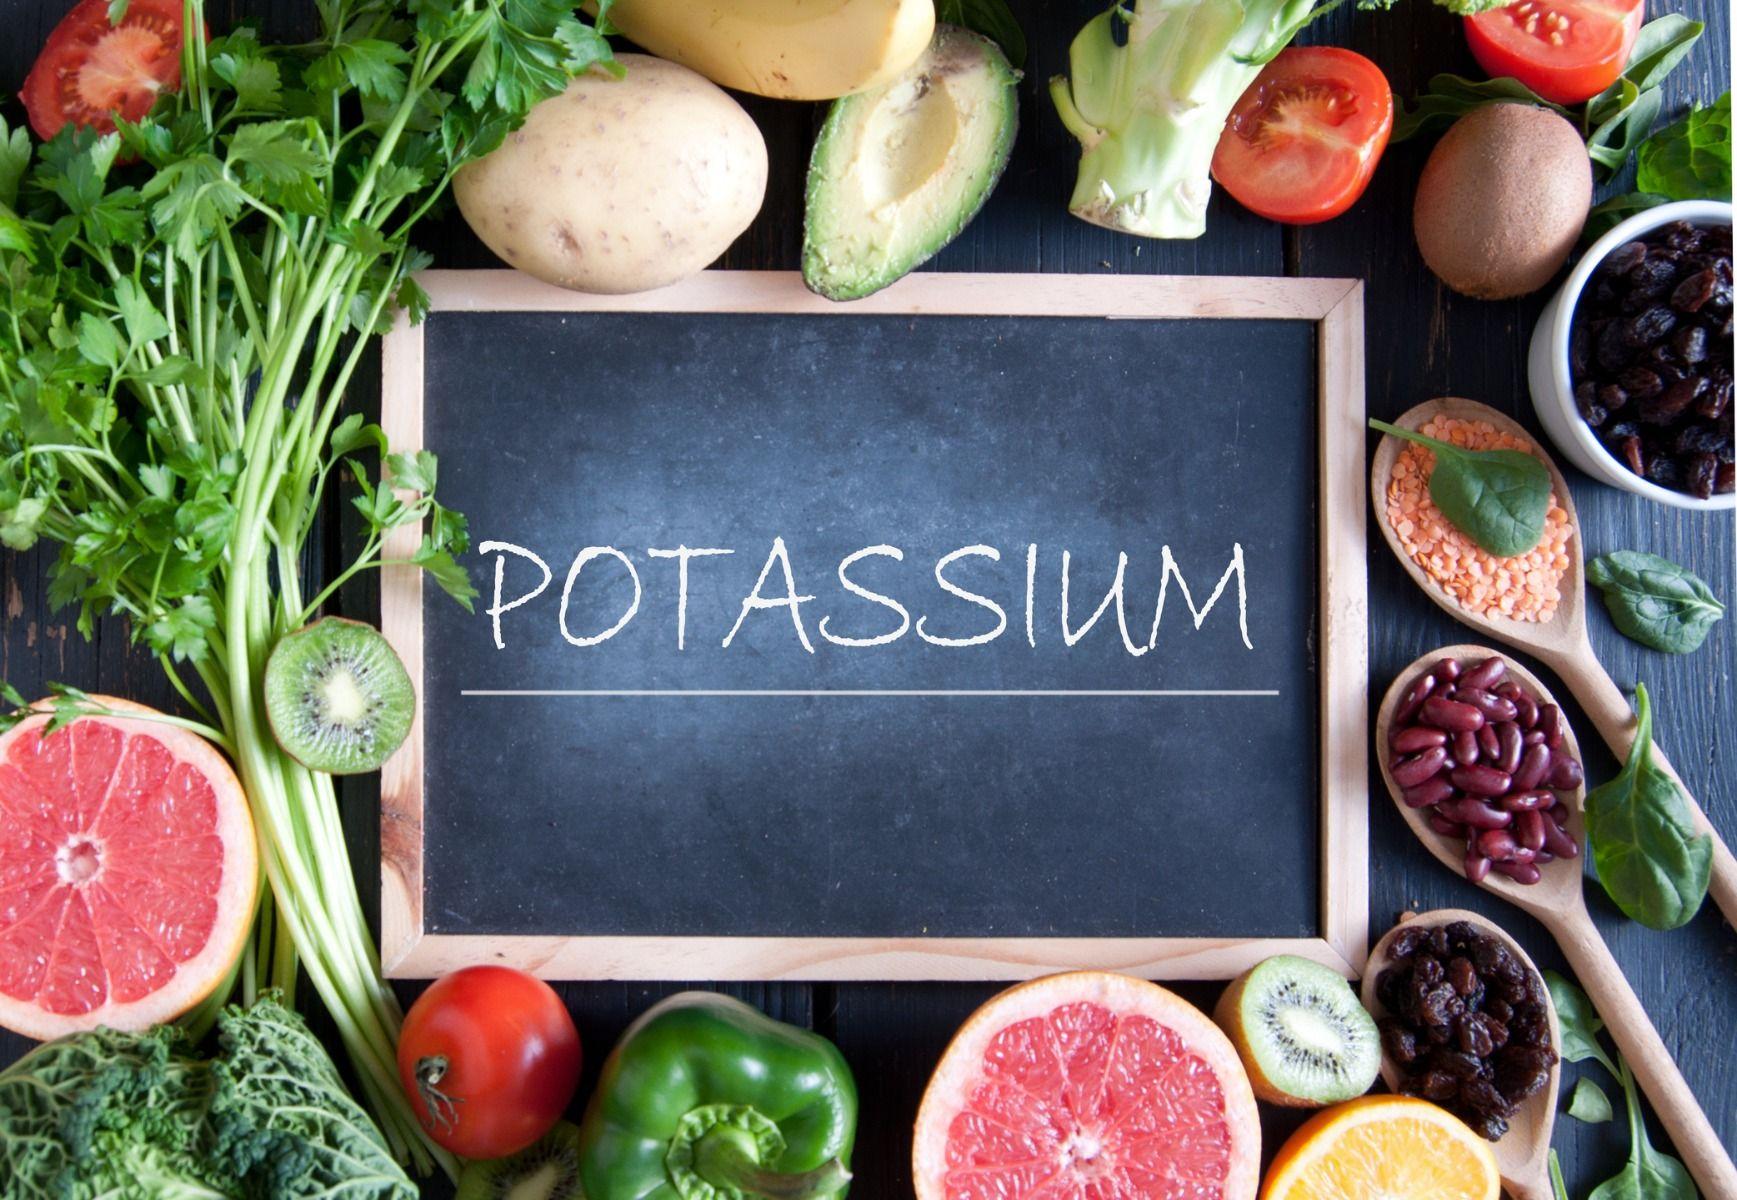 draslík - potassium - gymbeam